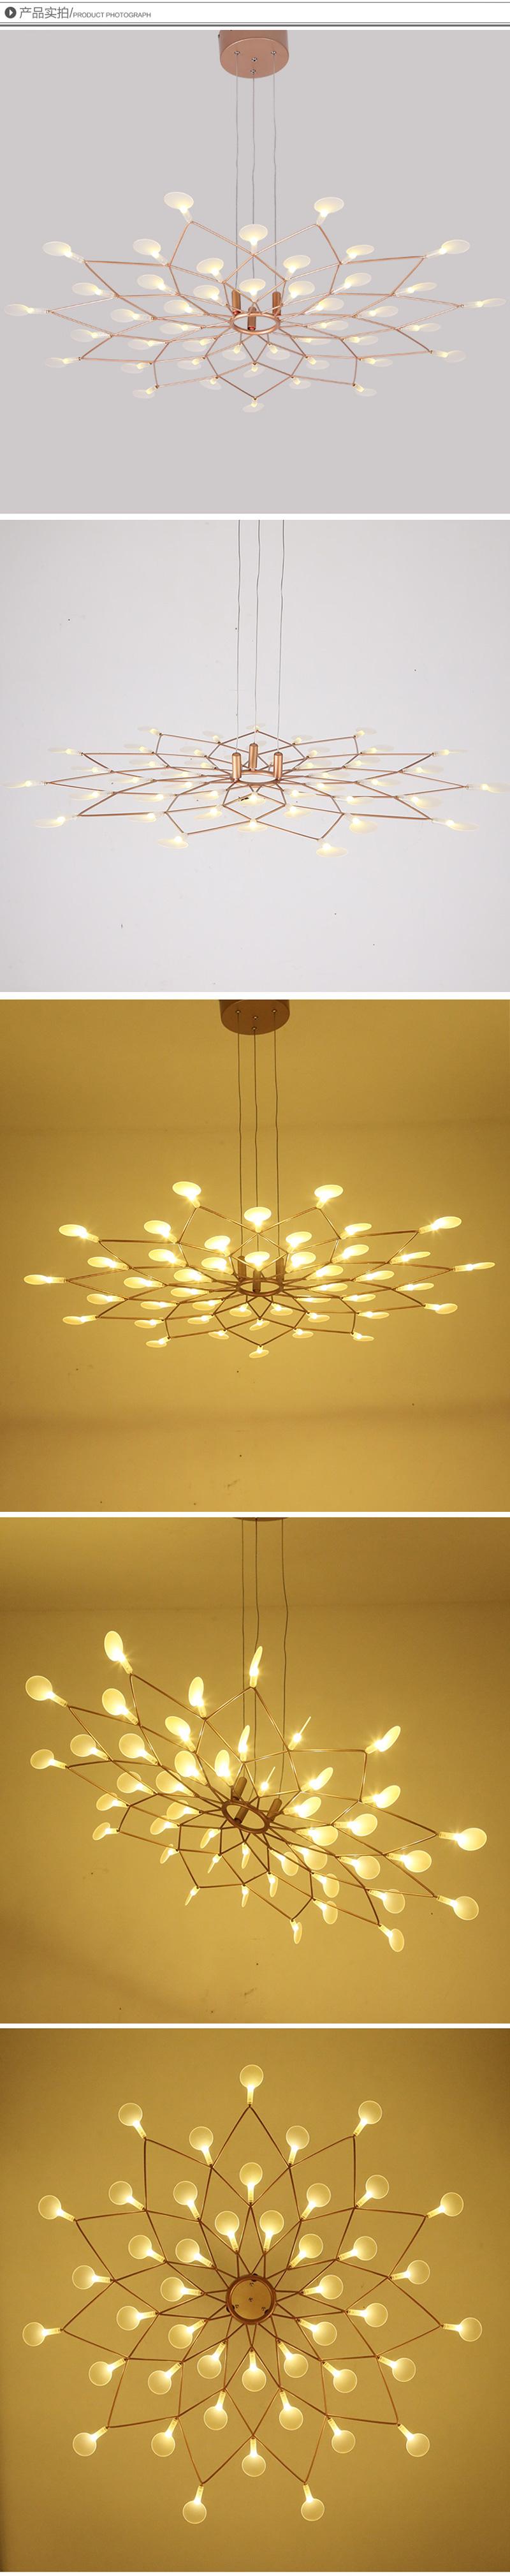 đèn heracleum ốp trần 05